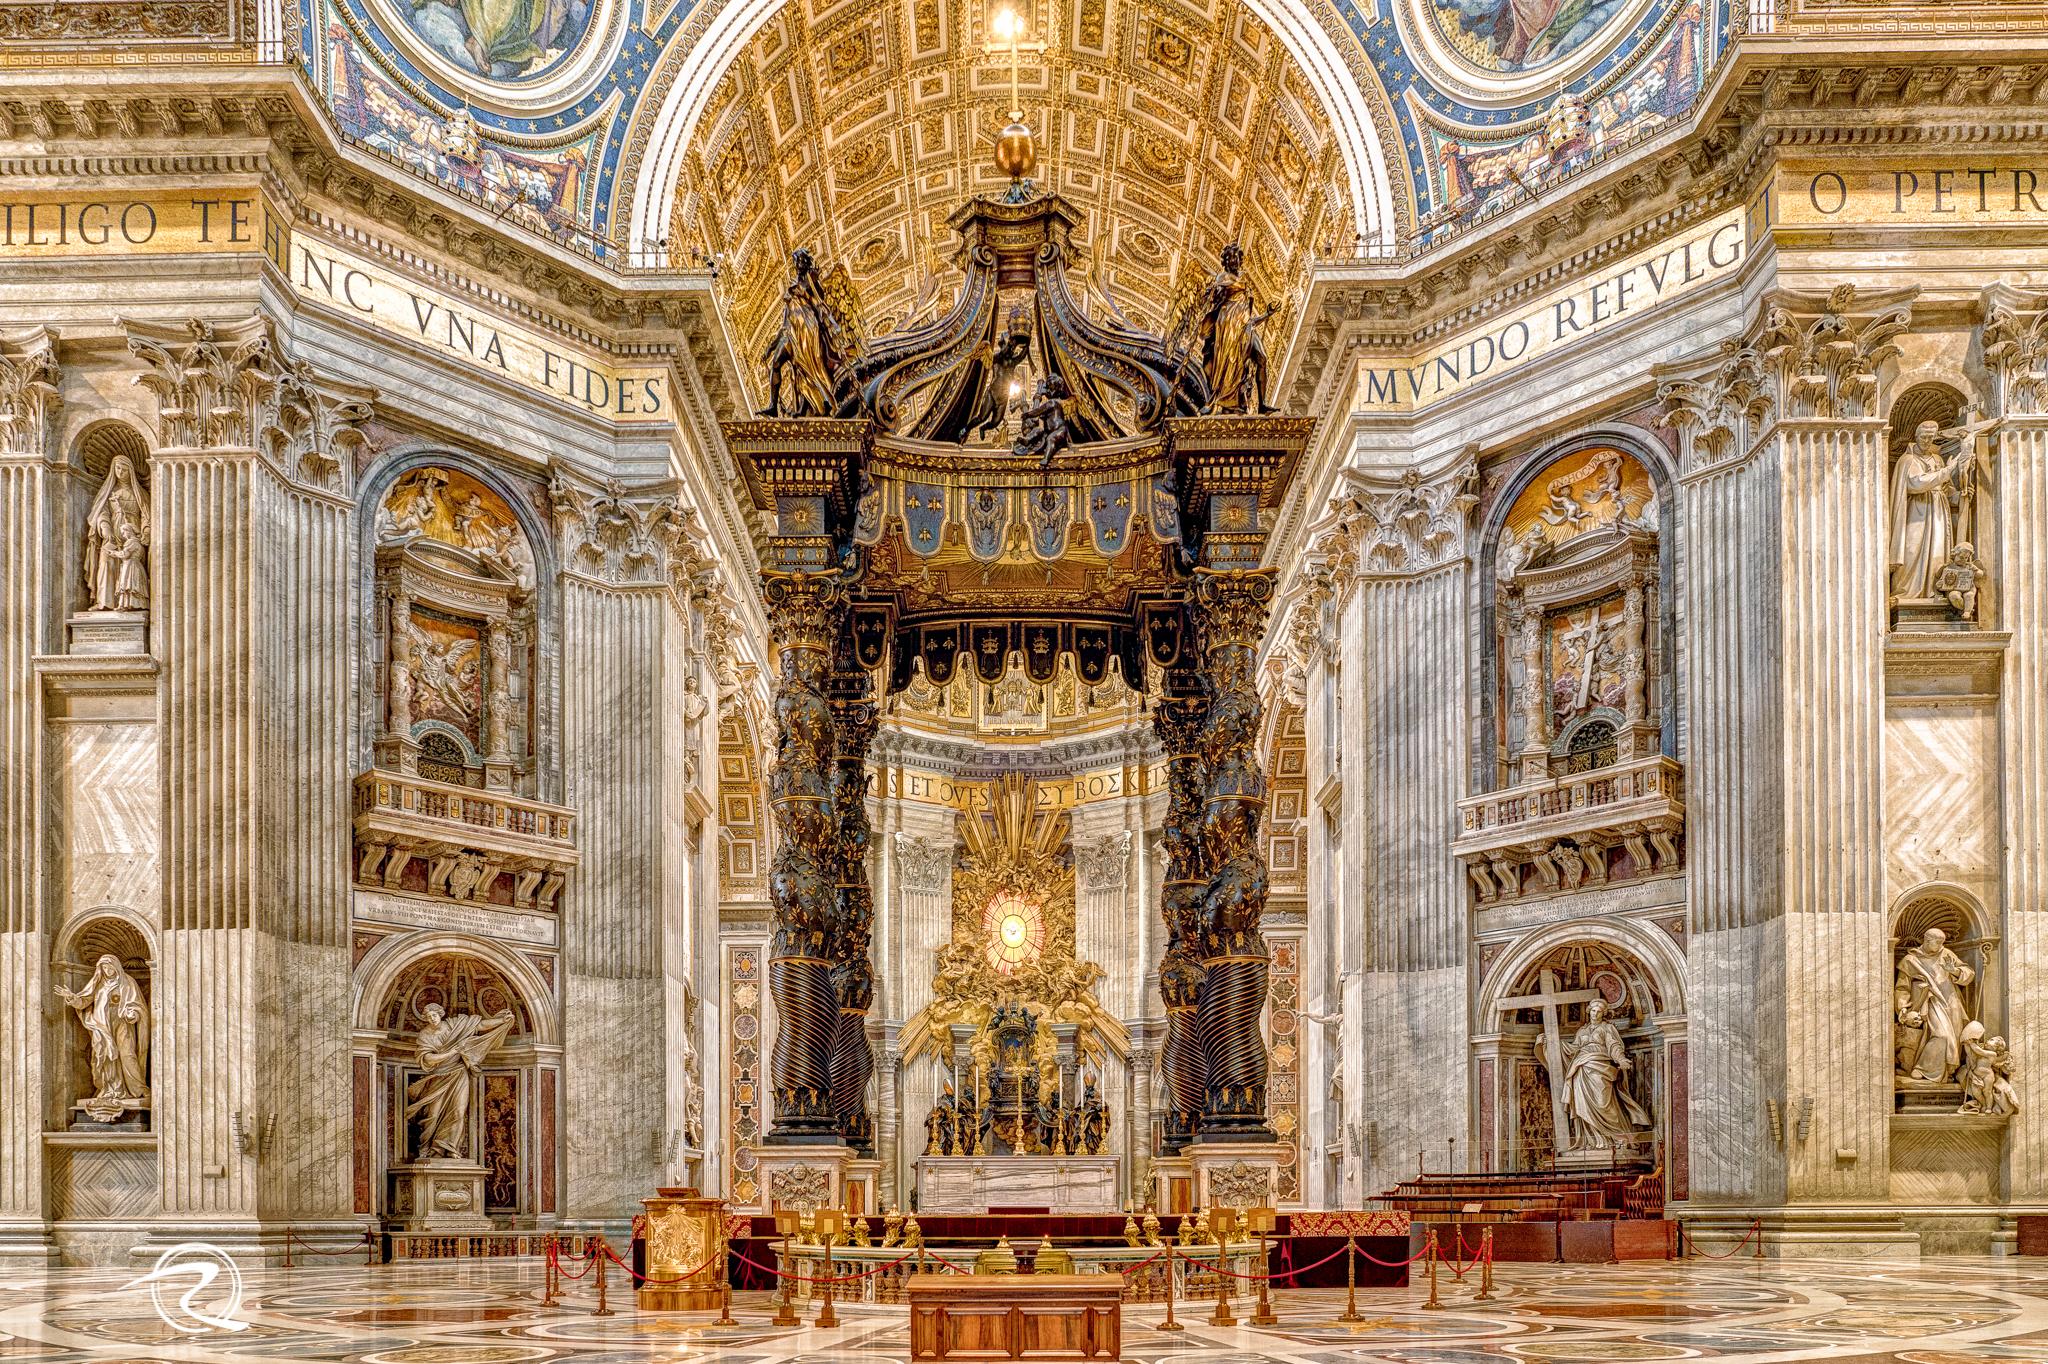 St Peter´s Basilica